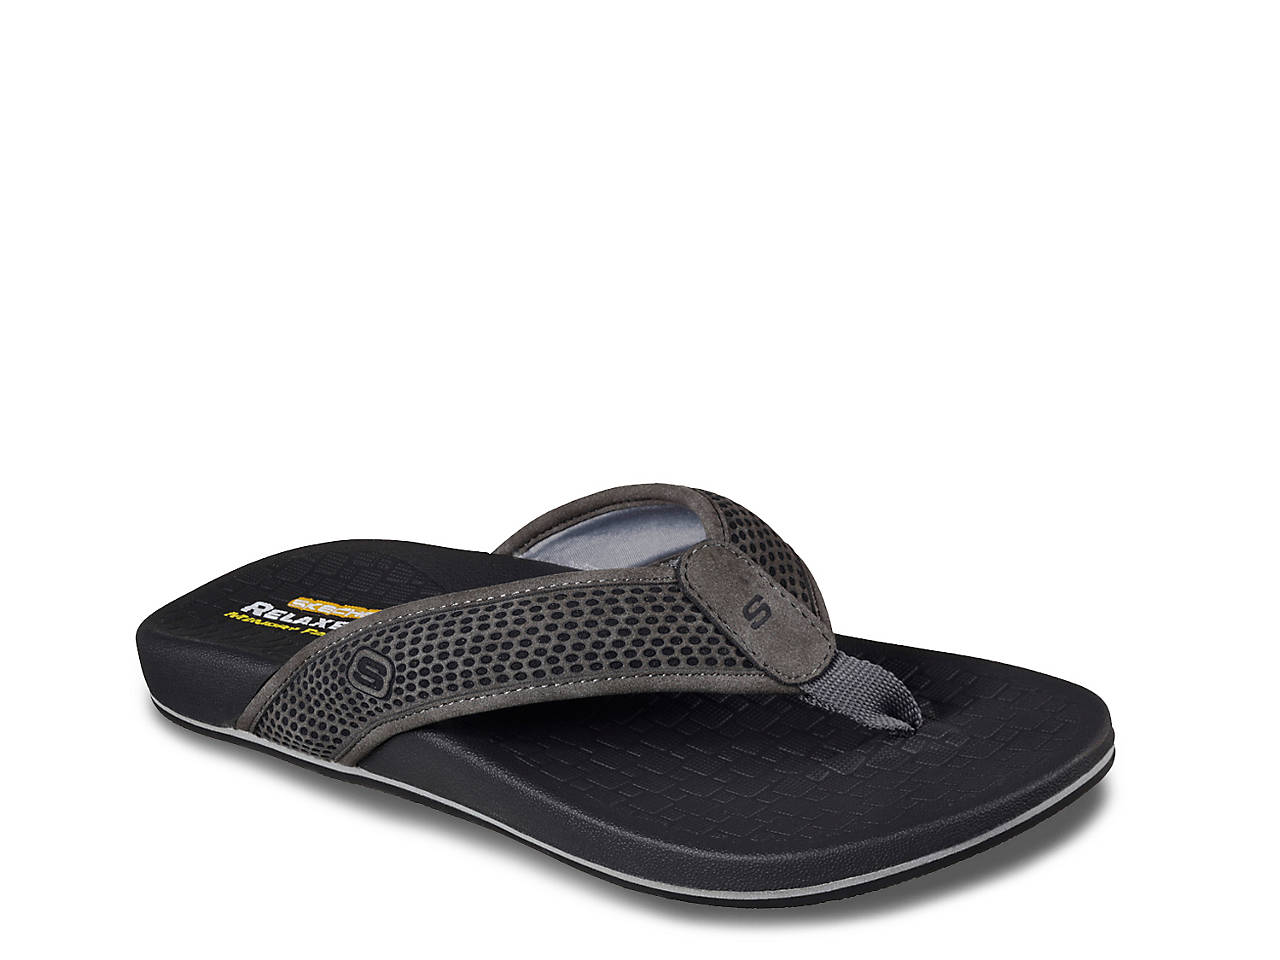 27834ba202987 Skechers Relaxed Fit Emiro Flip Flop Men s Shoes